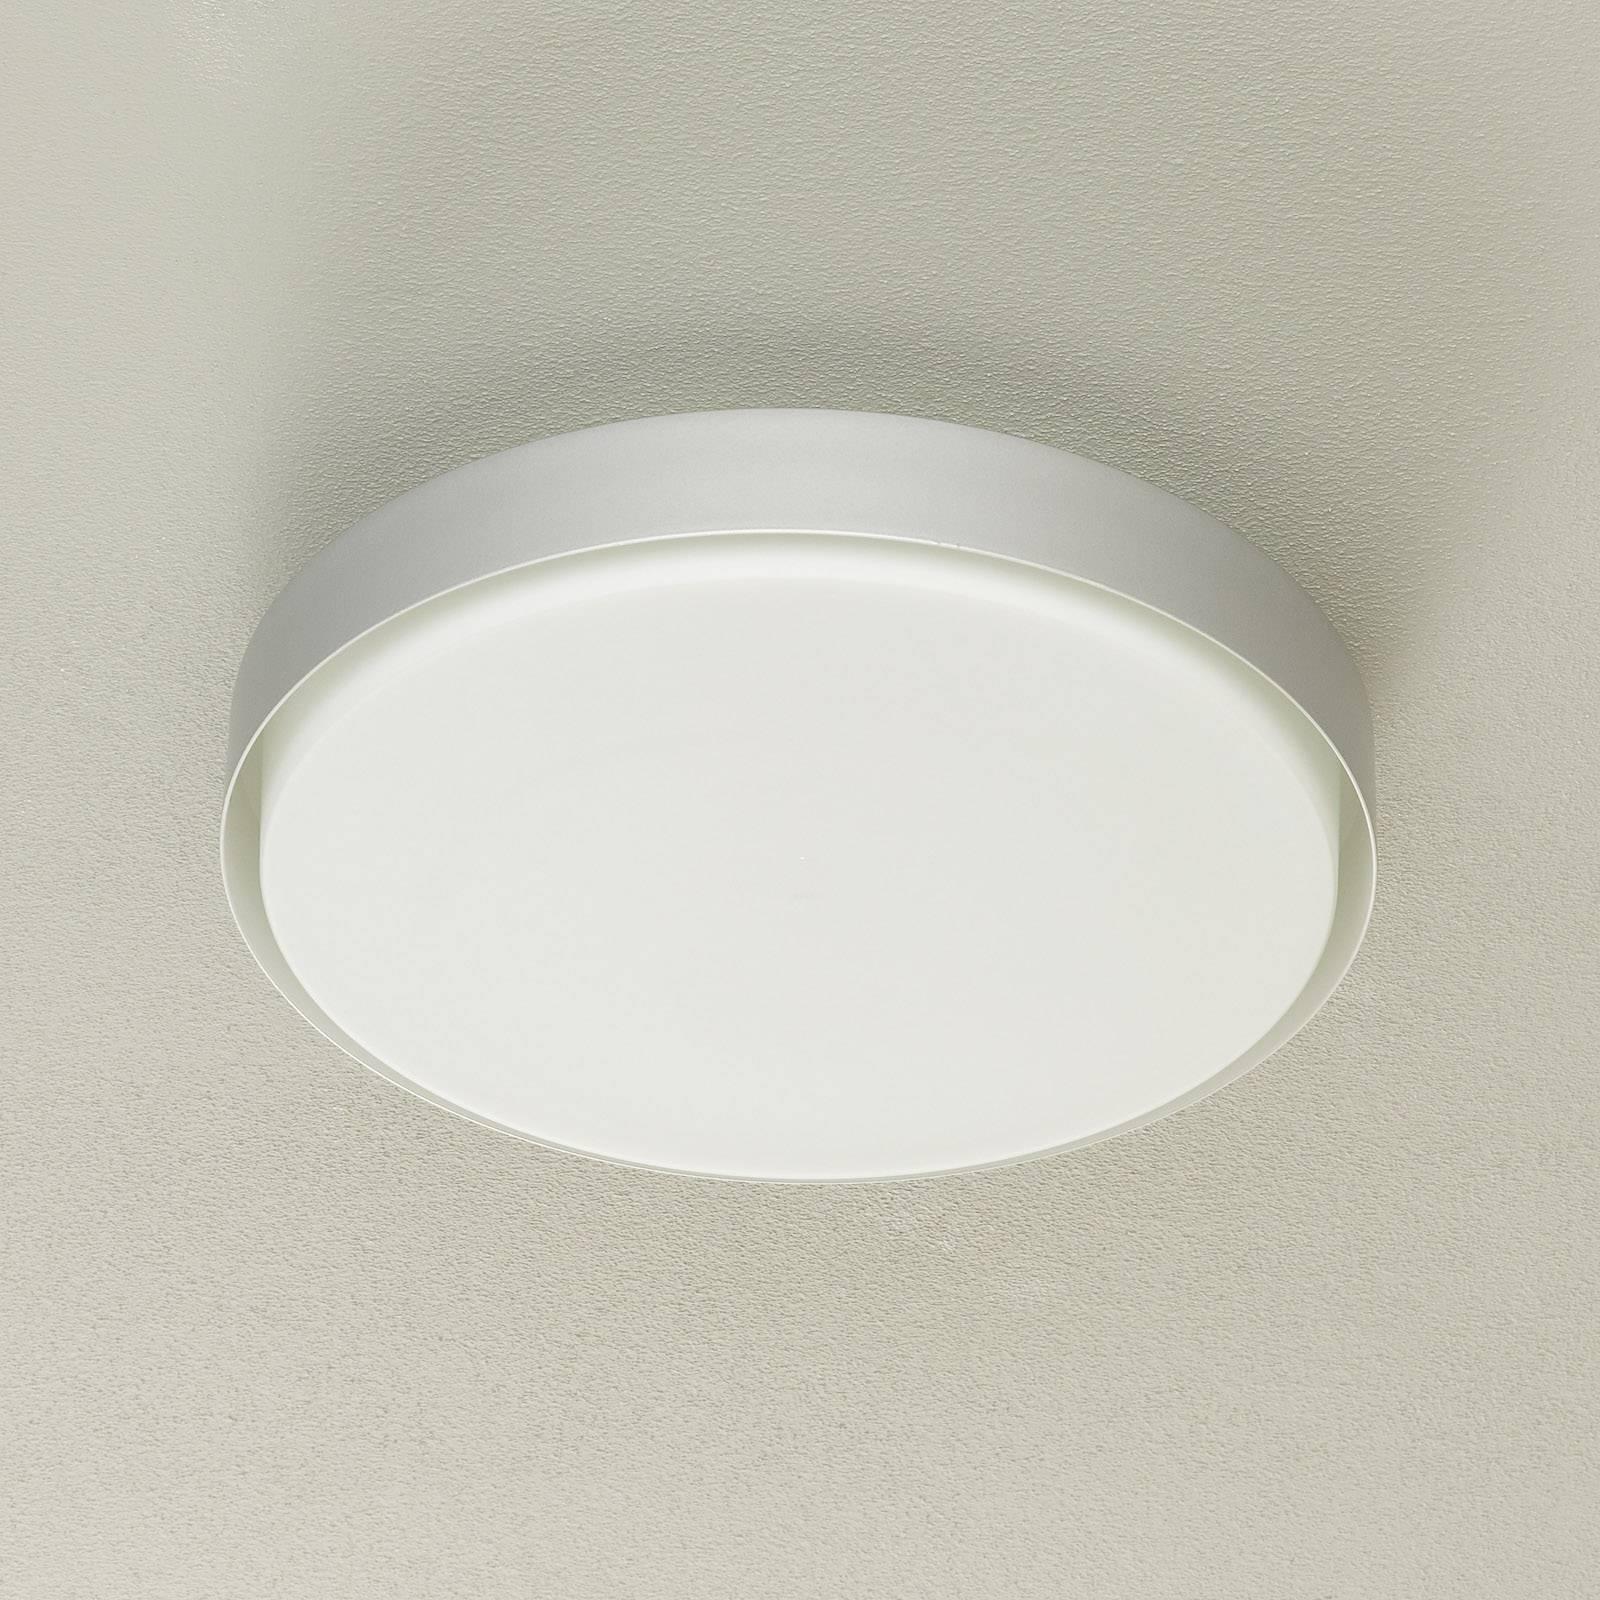 BEGA 34279 LED-kattovalaisin, alumiini, Ø 42 cm